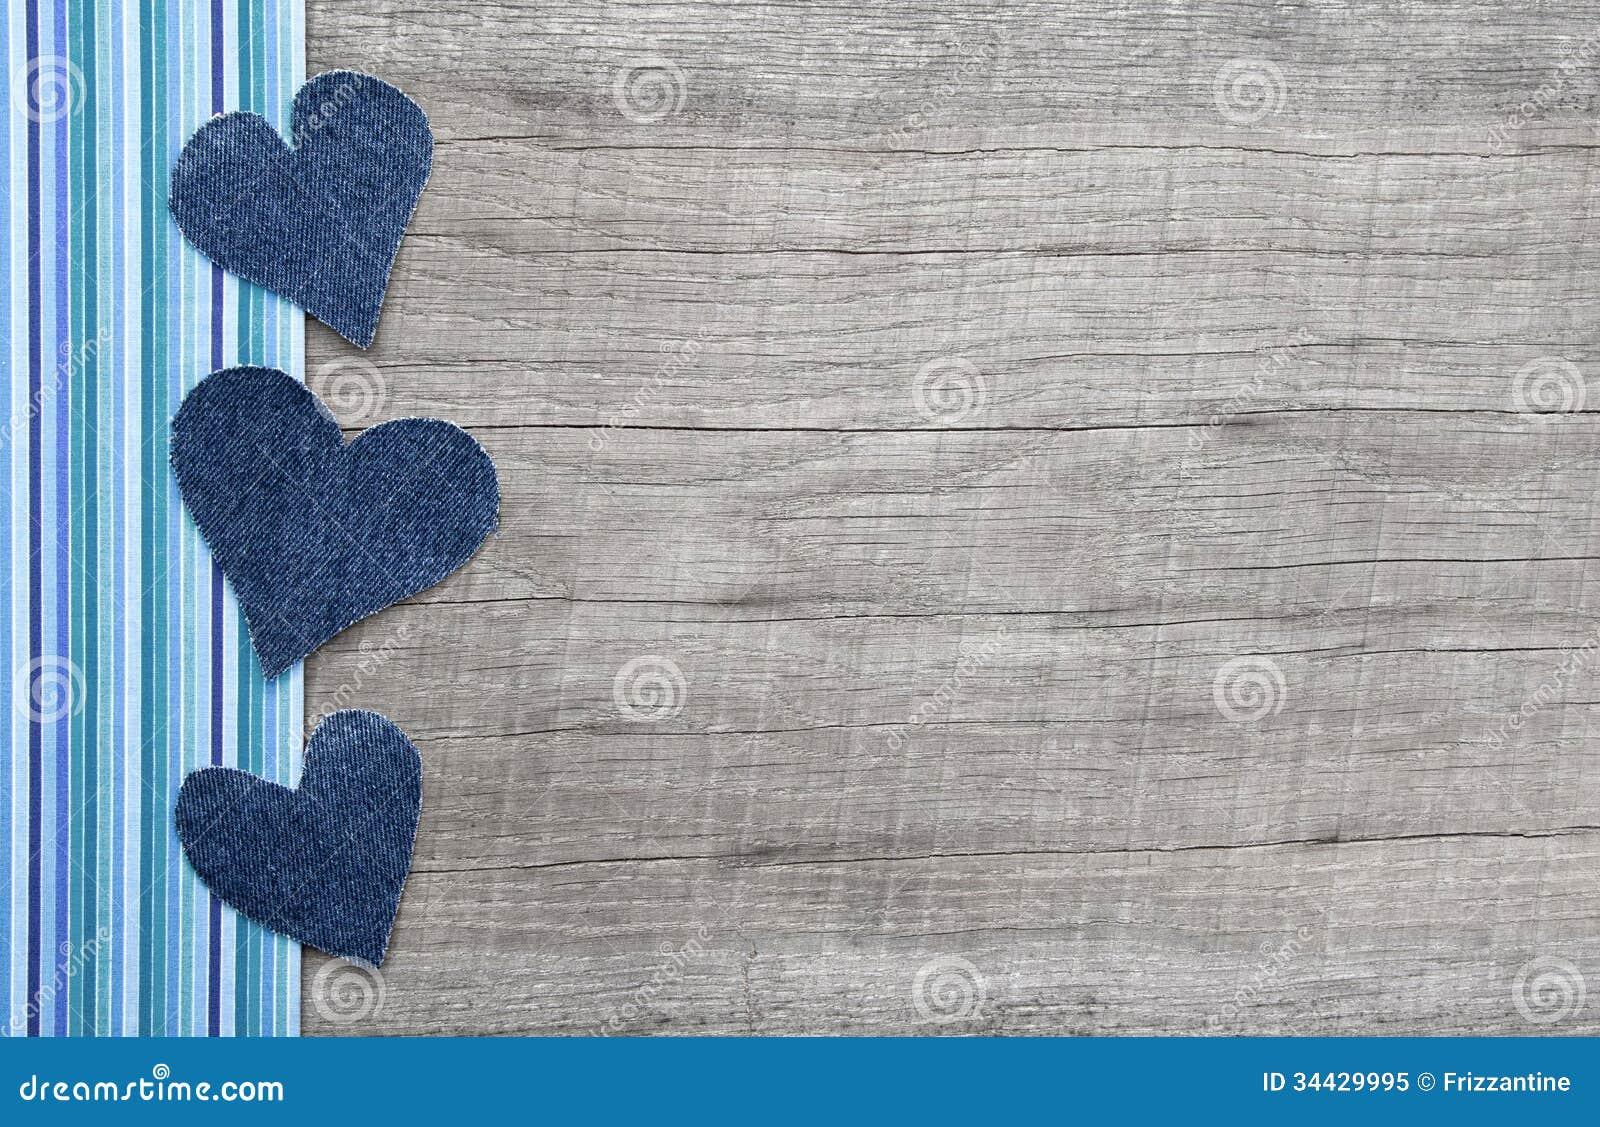 I Love You Heart Wallpaper 3d Denim Hearts On Grey S...